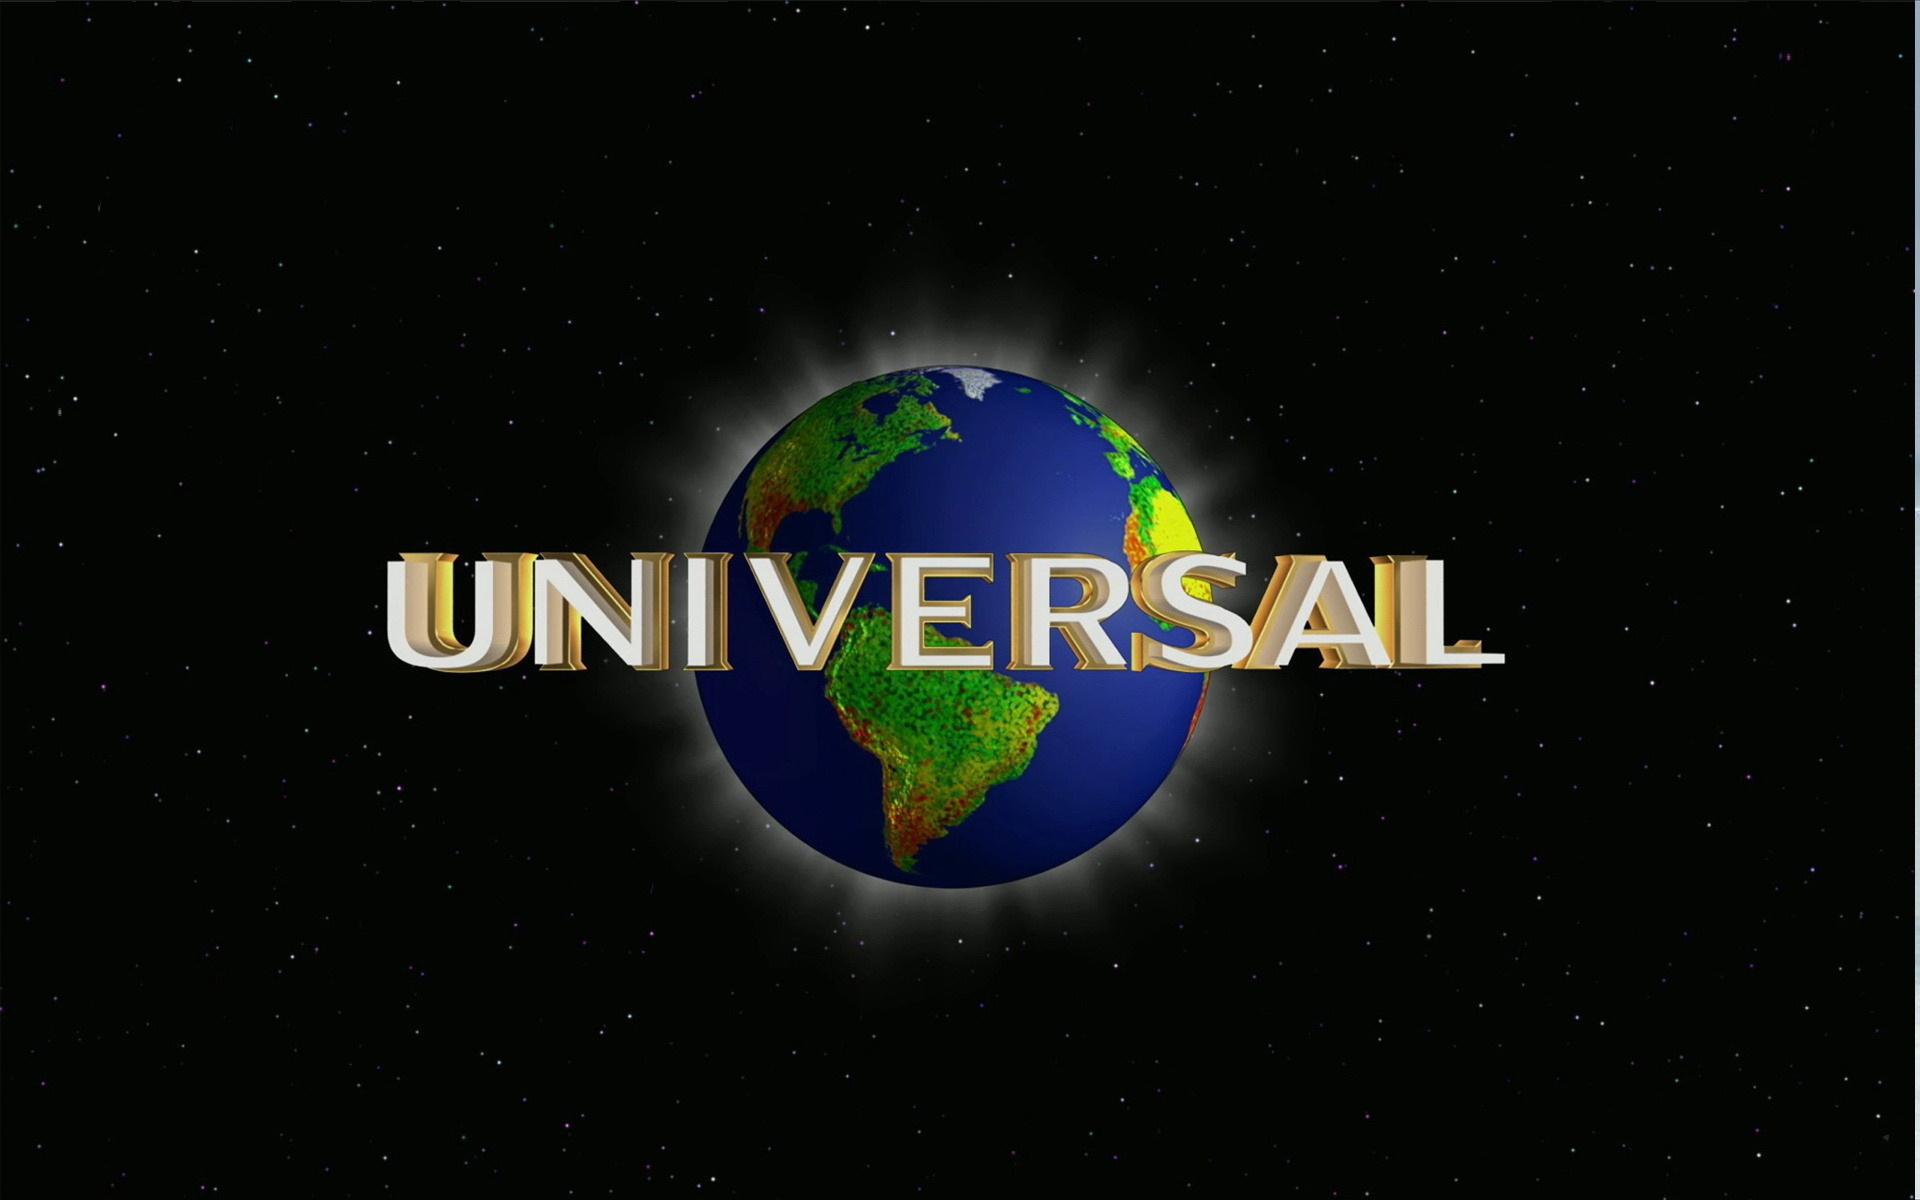 universal studios universal studios universal studios hollywood 1920x1200